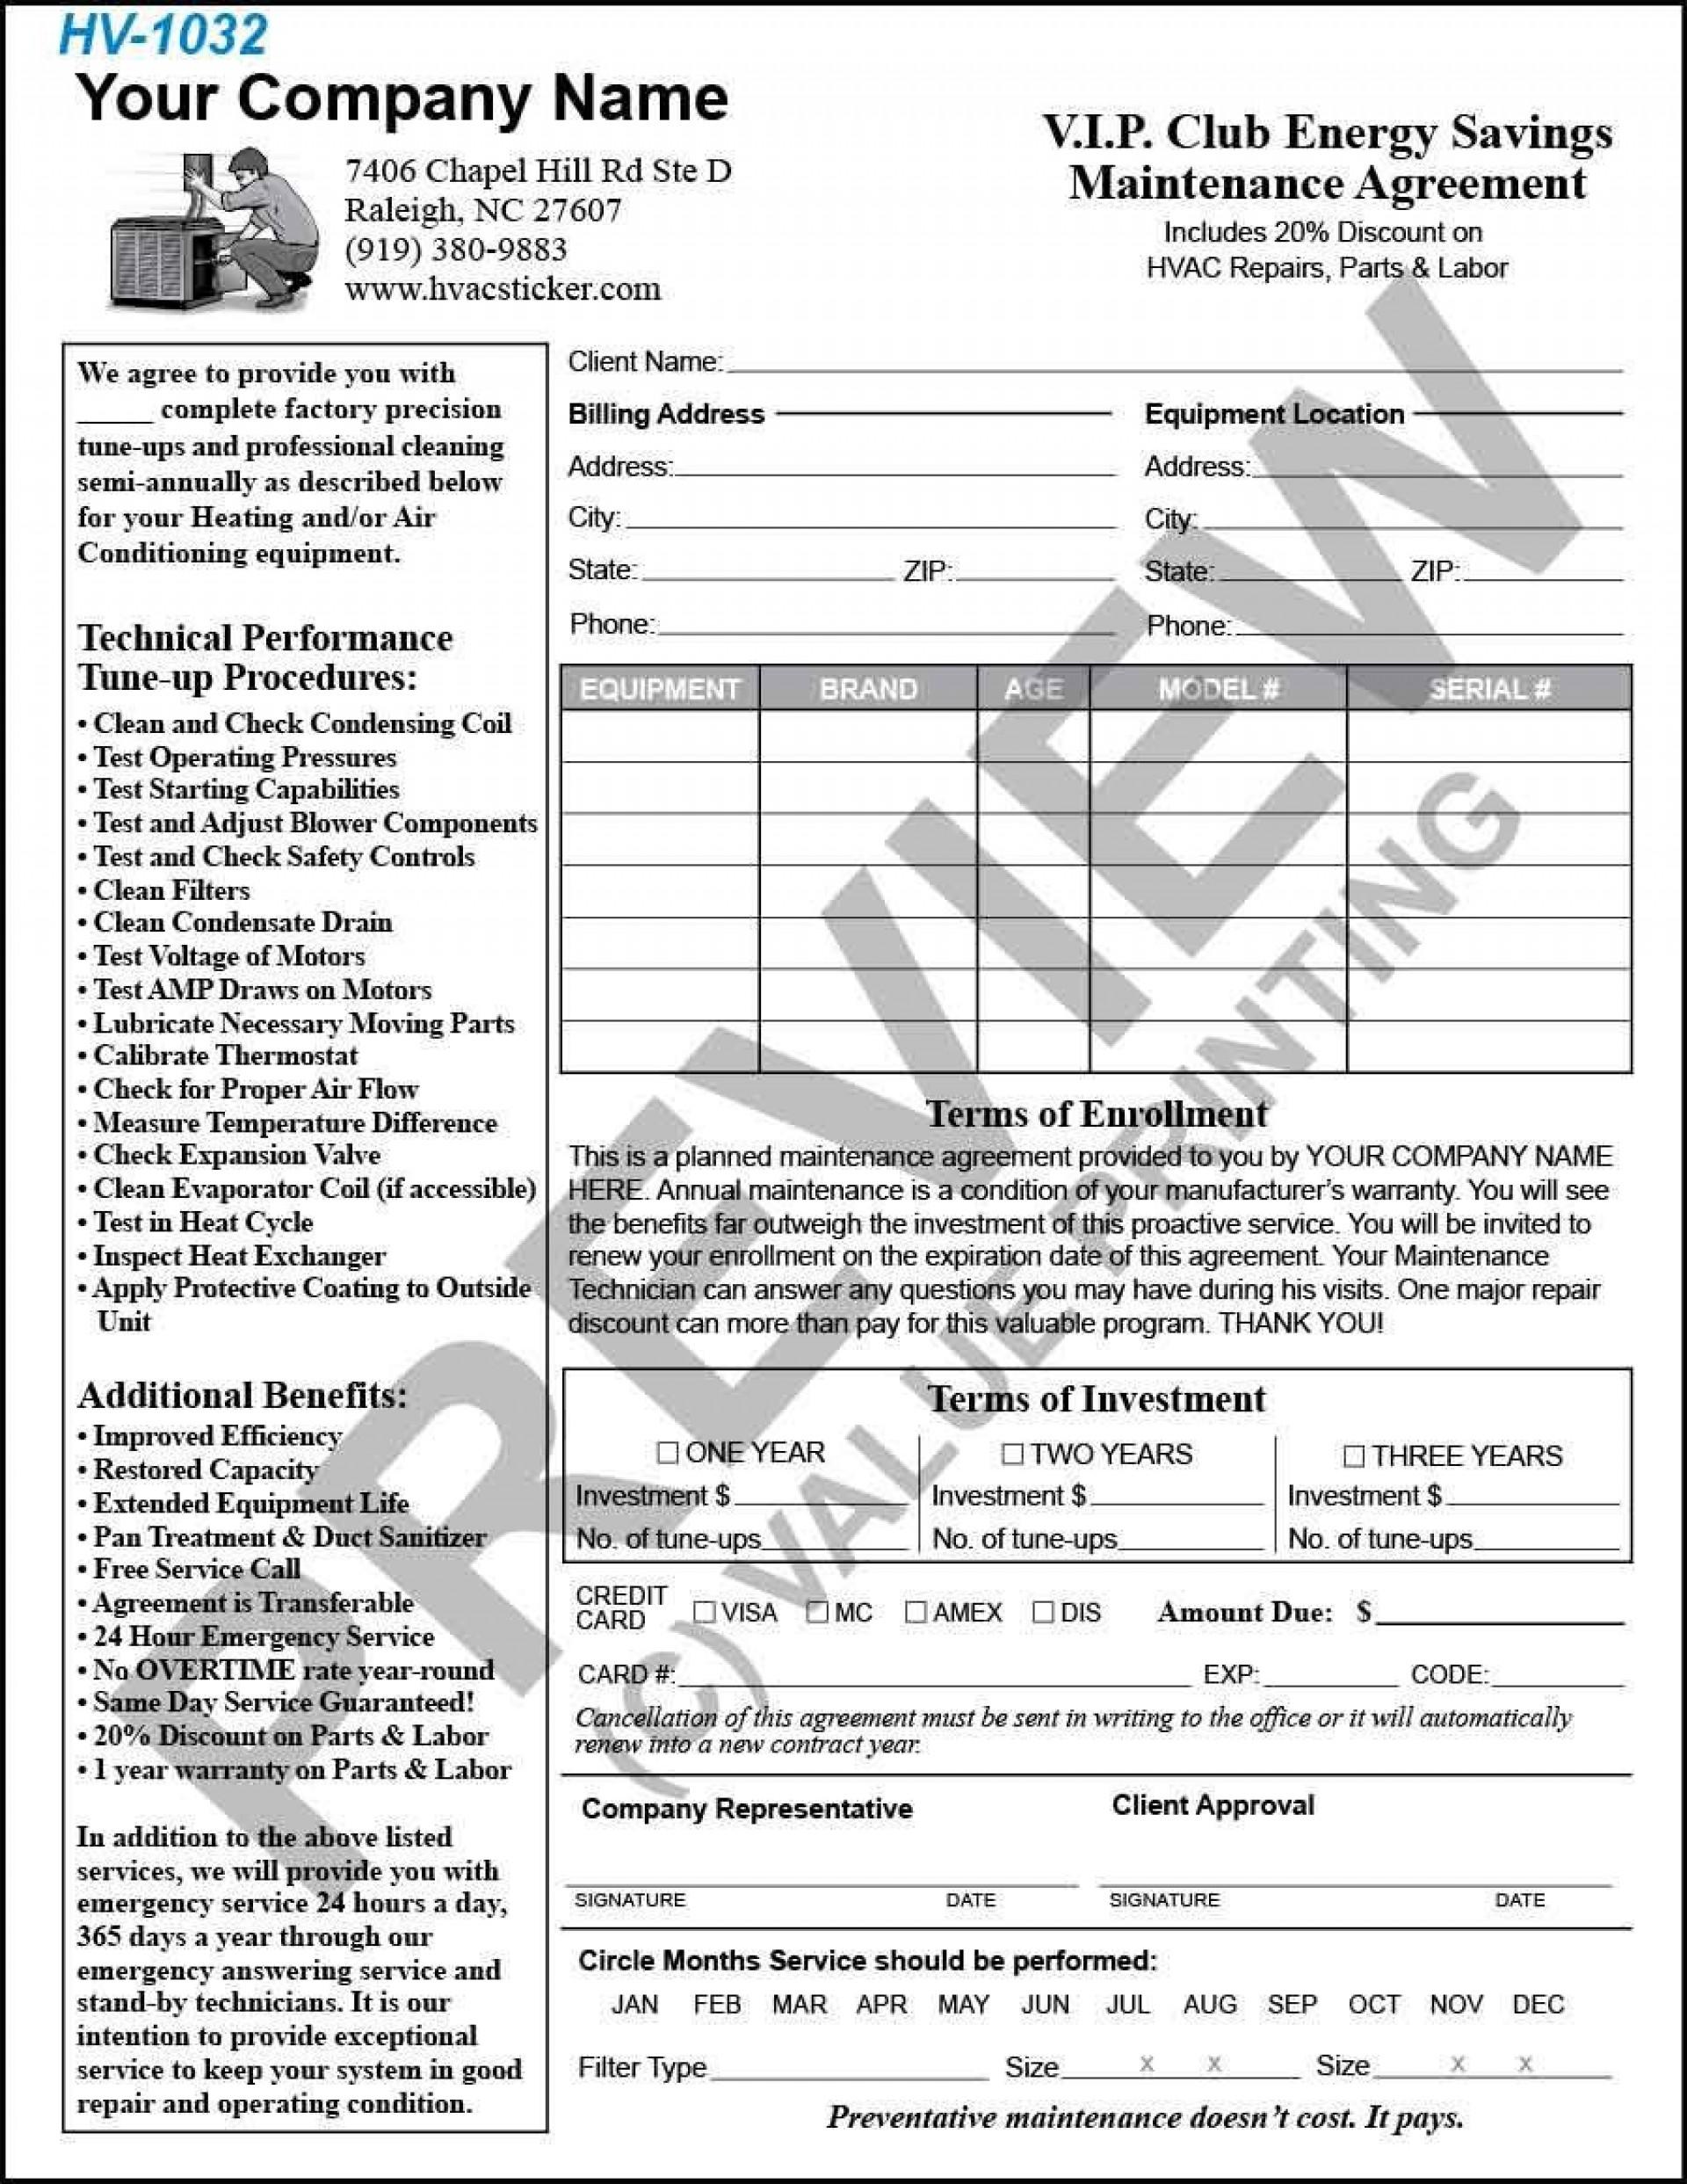 002 Rare Hvac Service Agreement Template Photo  Contract Form Maintenance Pdf1920